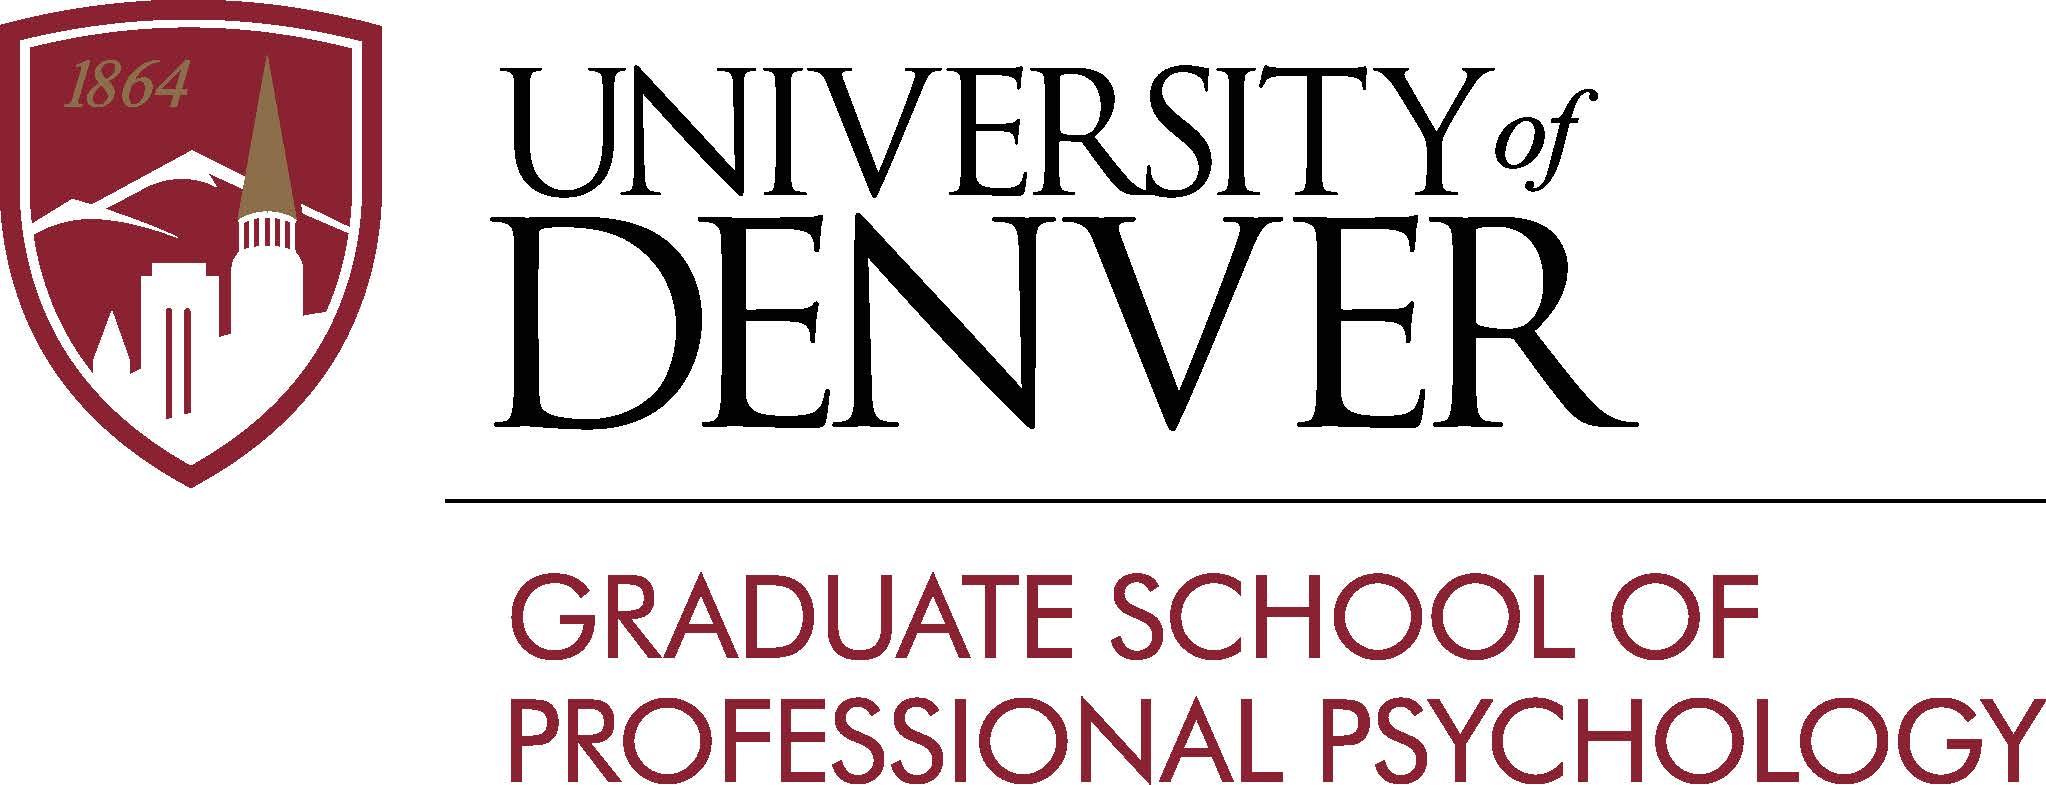 Graduate School of Professional Psychology-University of Denver